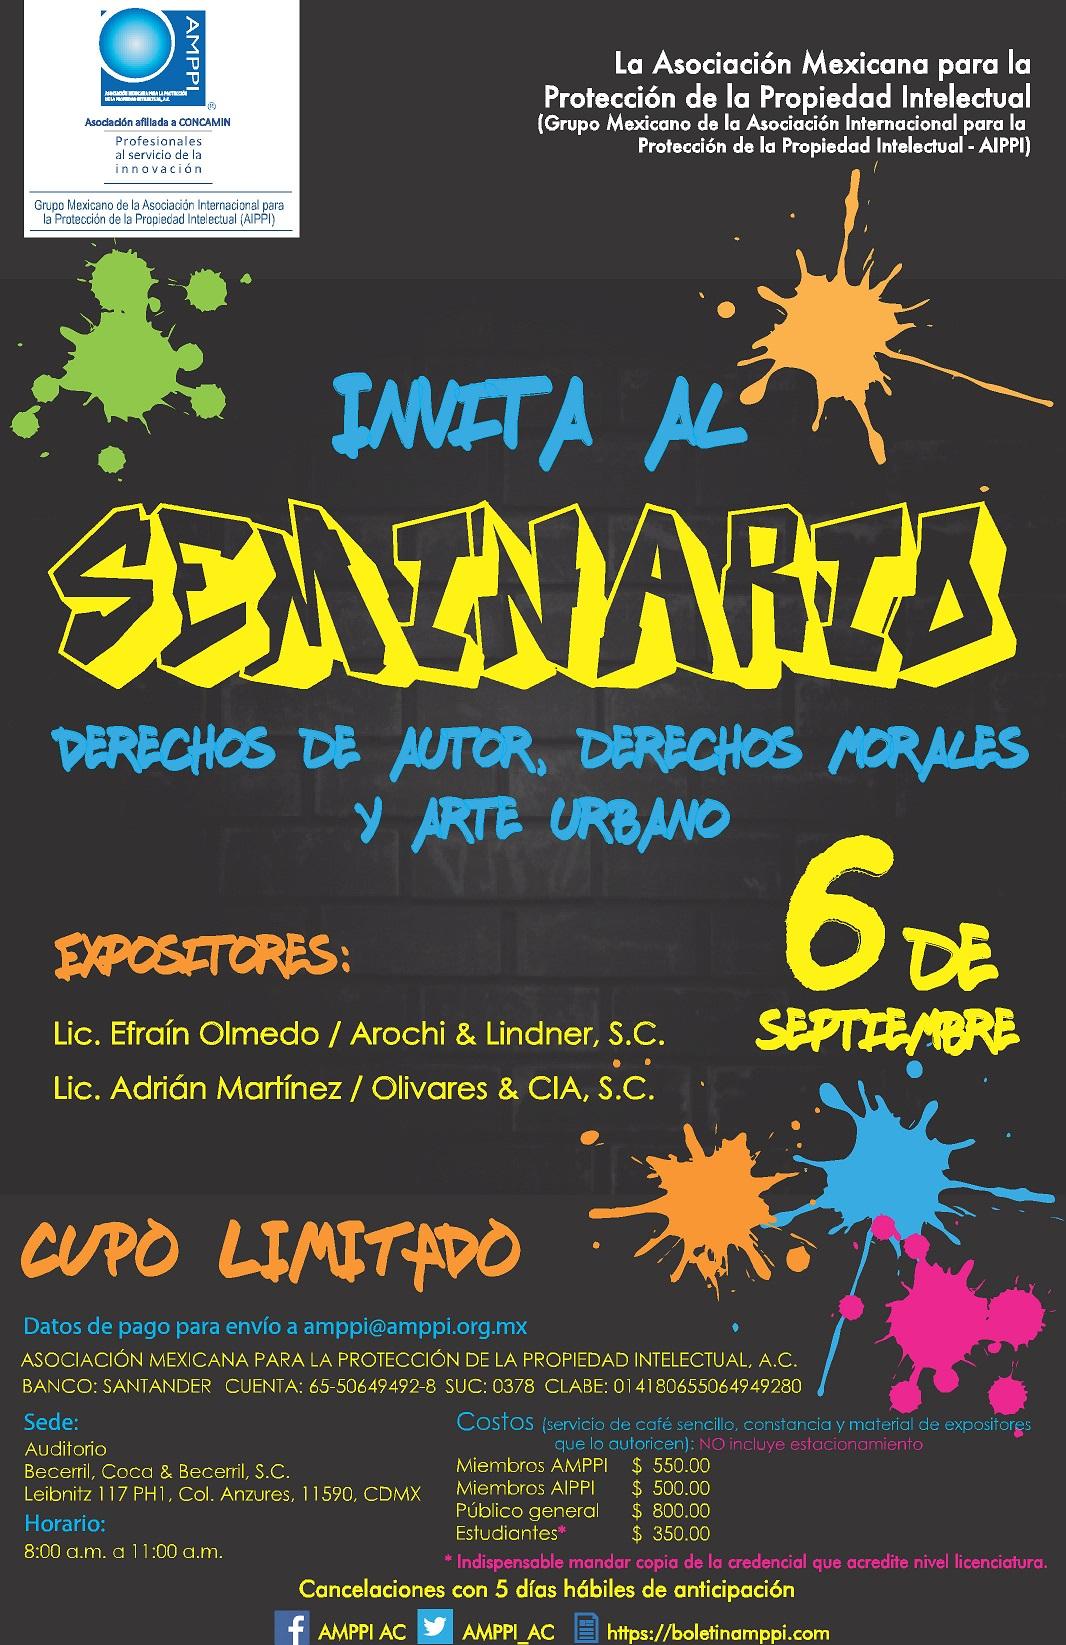 SeminarioDAyArteUrbano2 4sep18